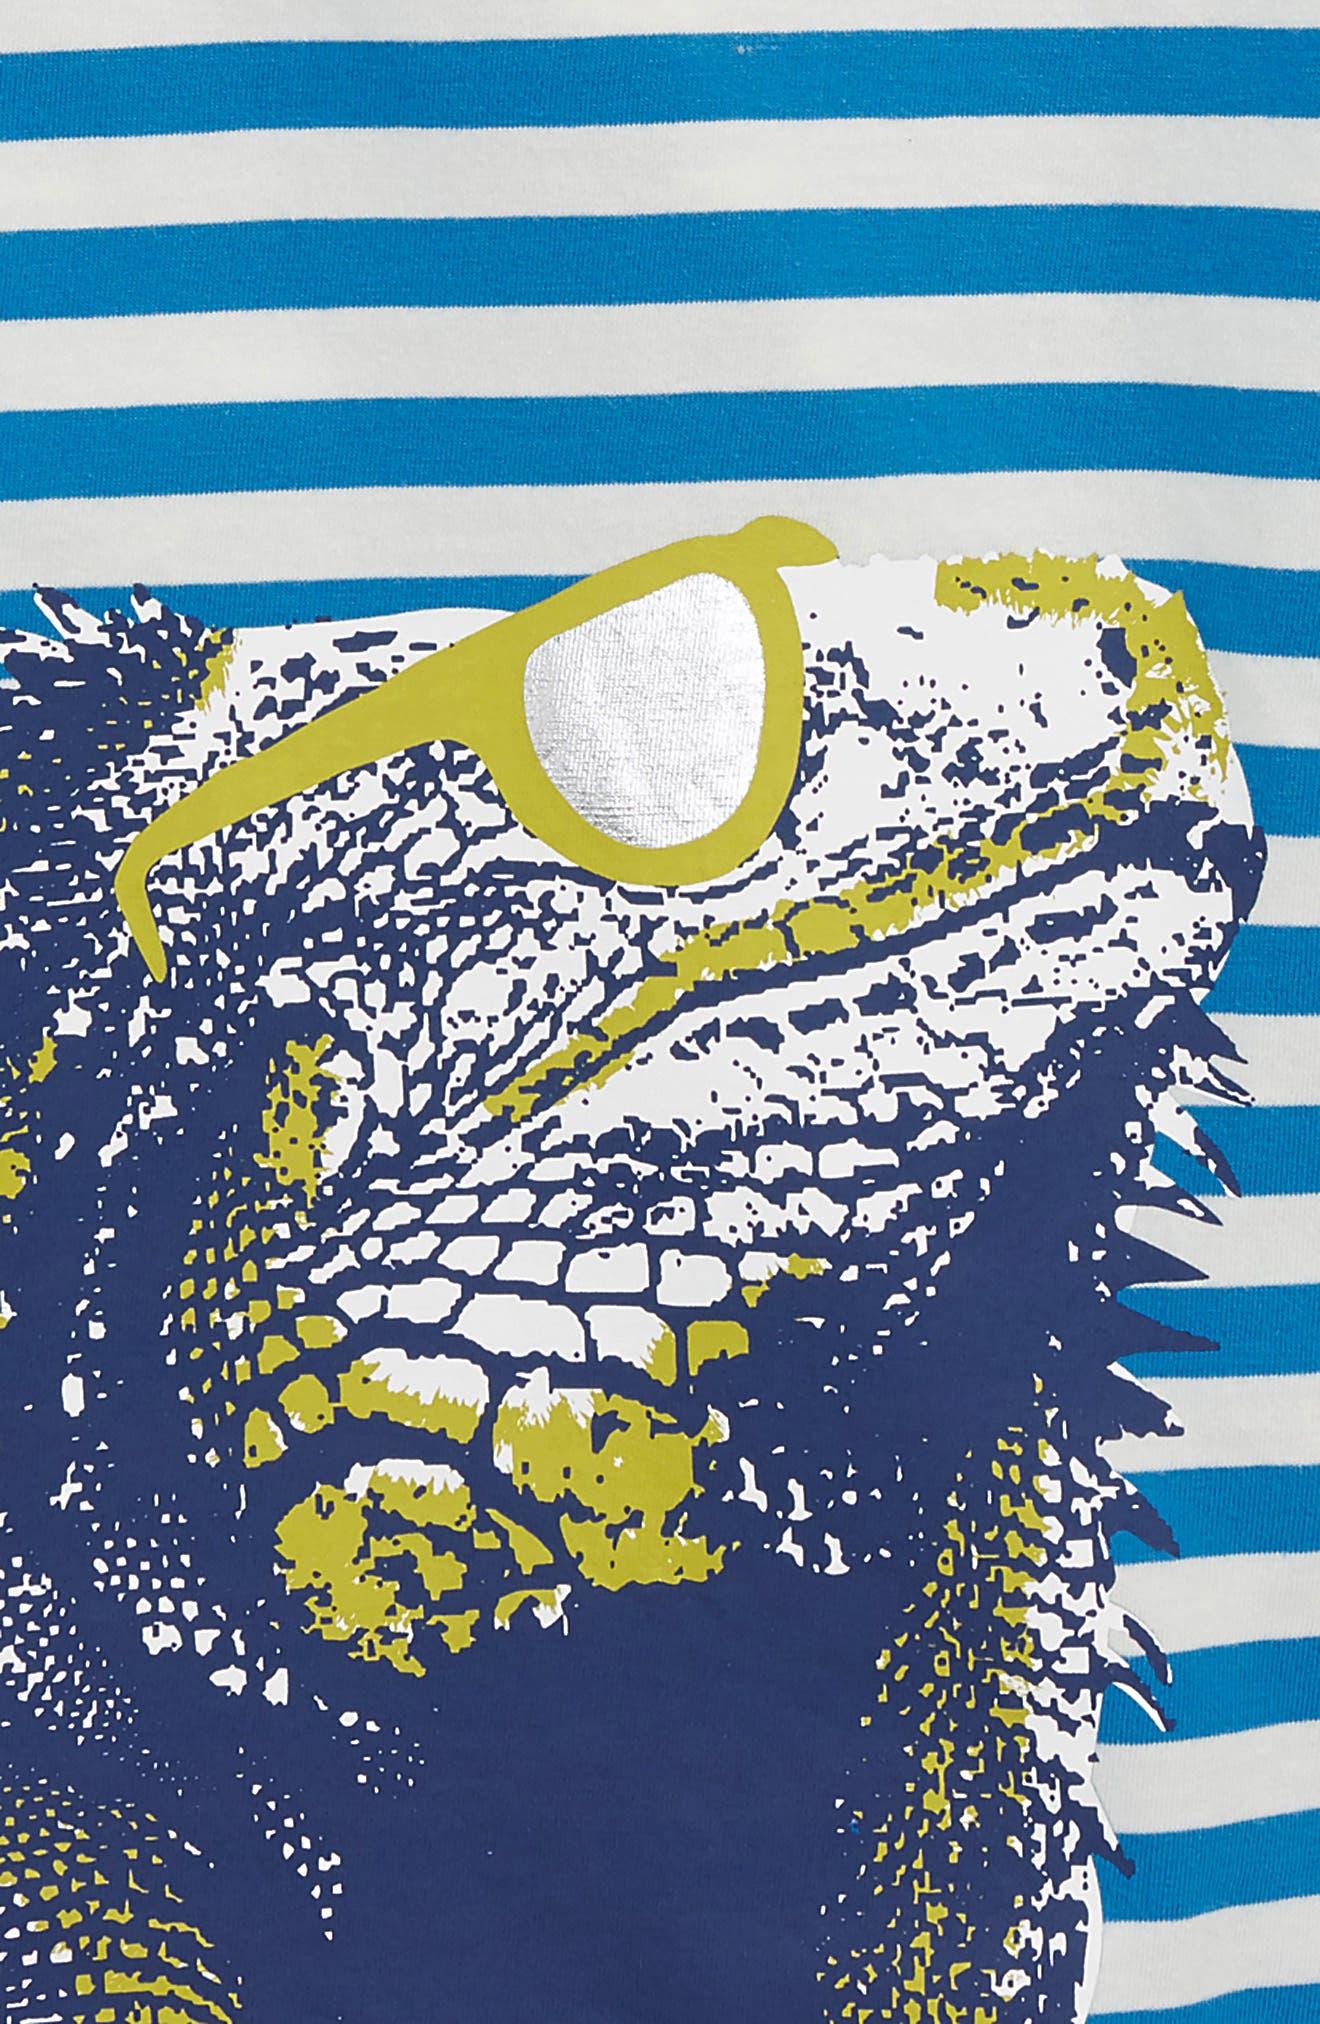 Arty Iguana T-Shirt,                             Alternate thumbnail 2, color,                             Yogo Blue/ Ecru Iguana